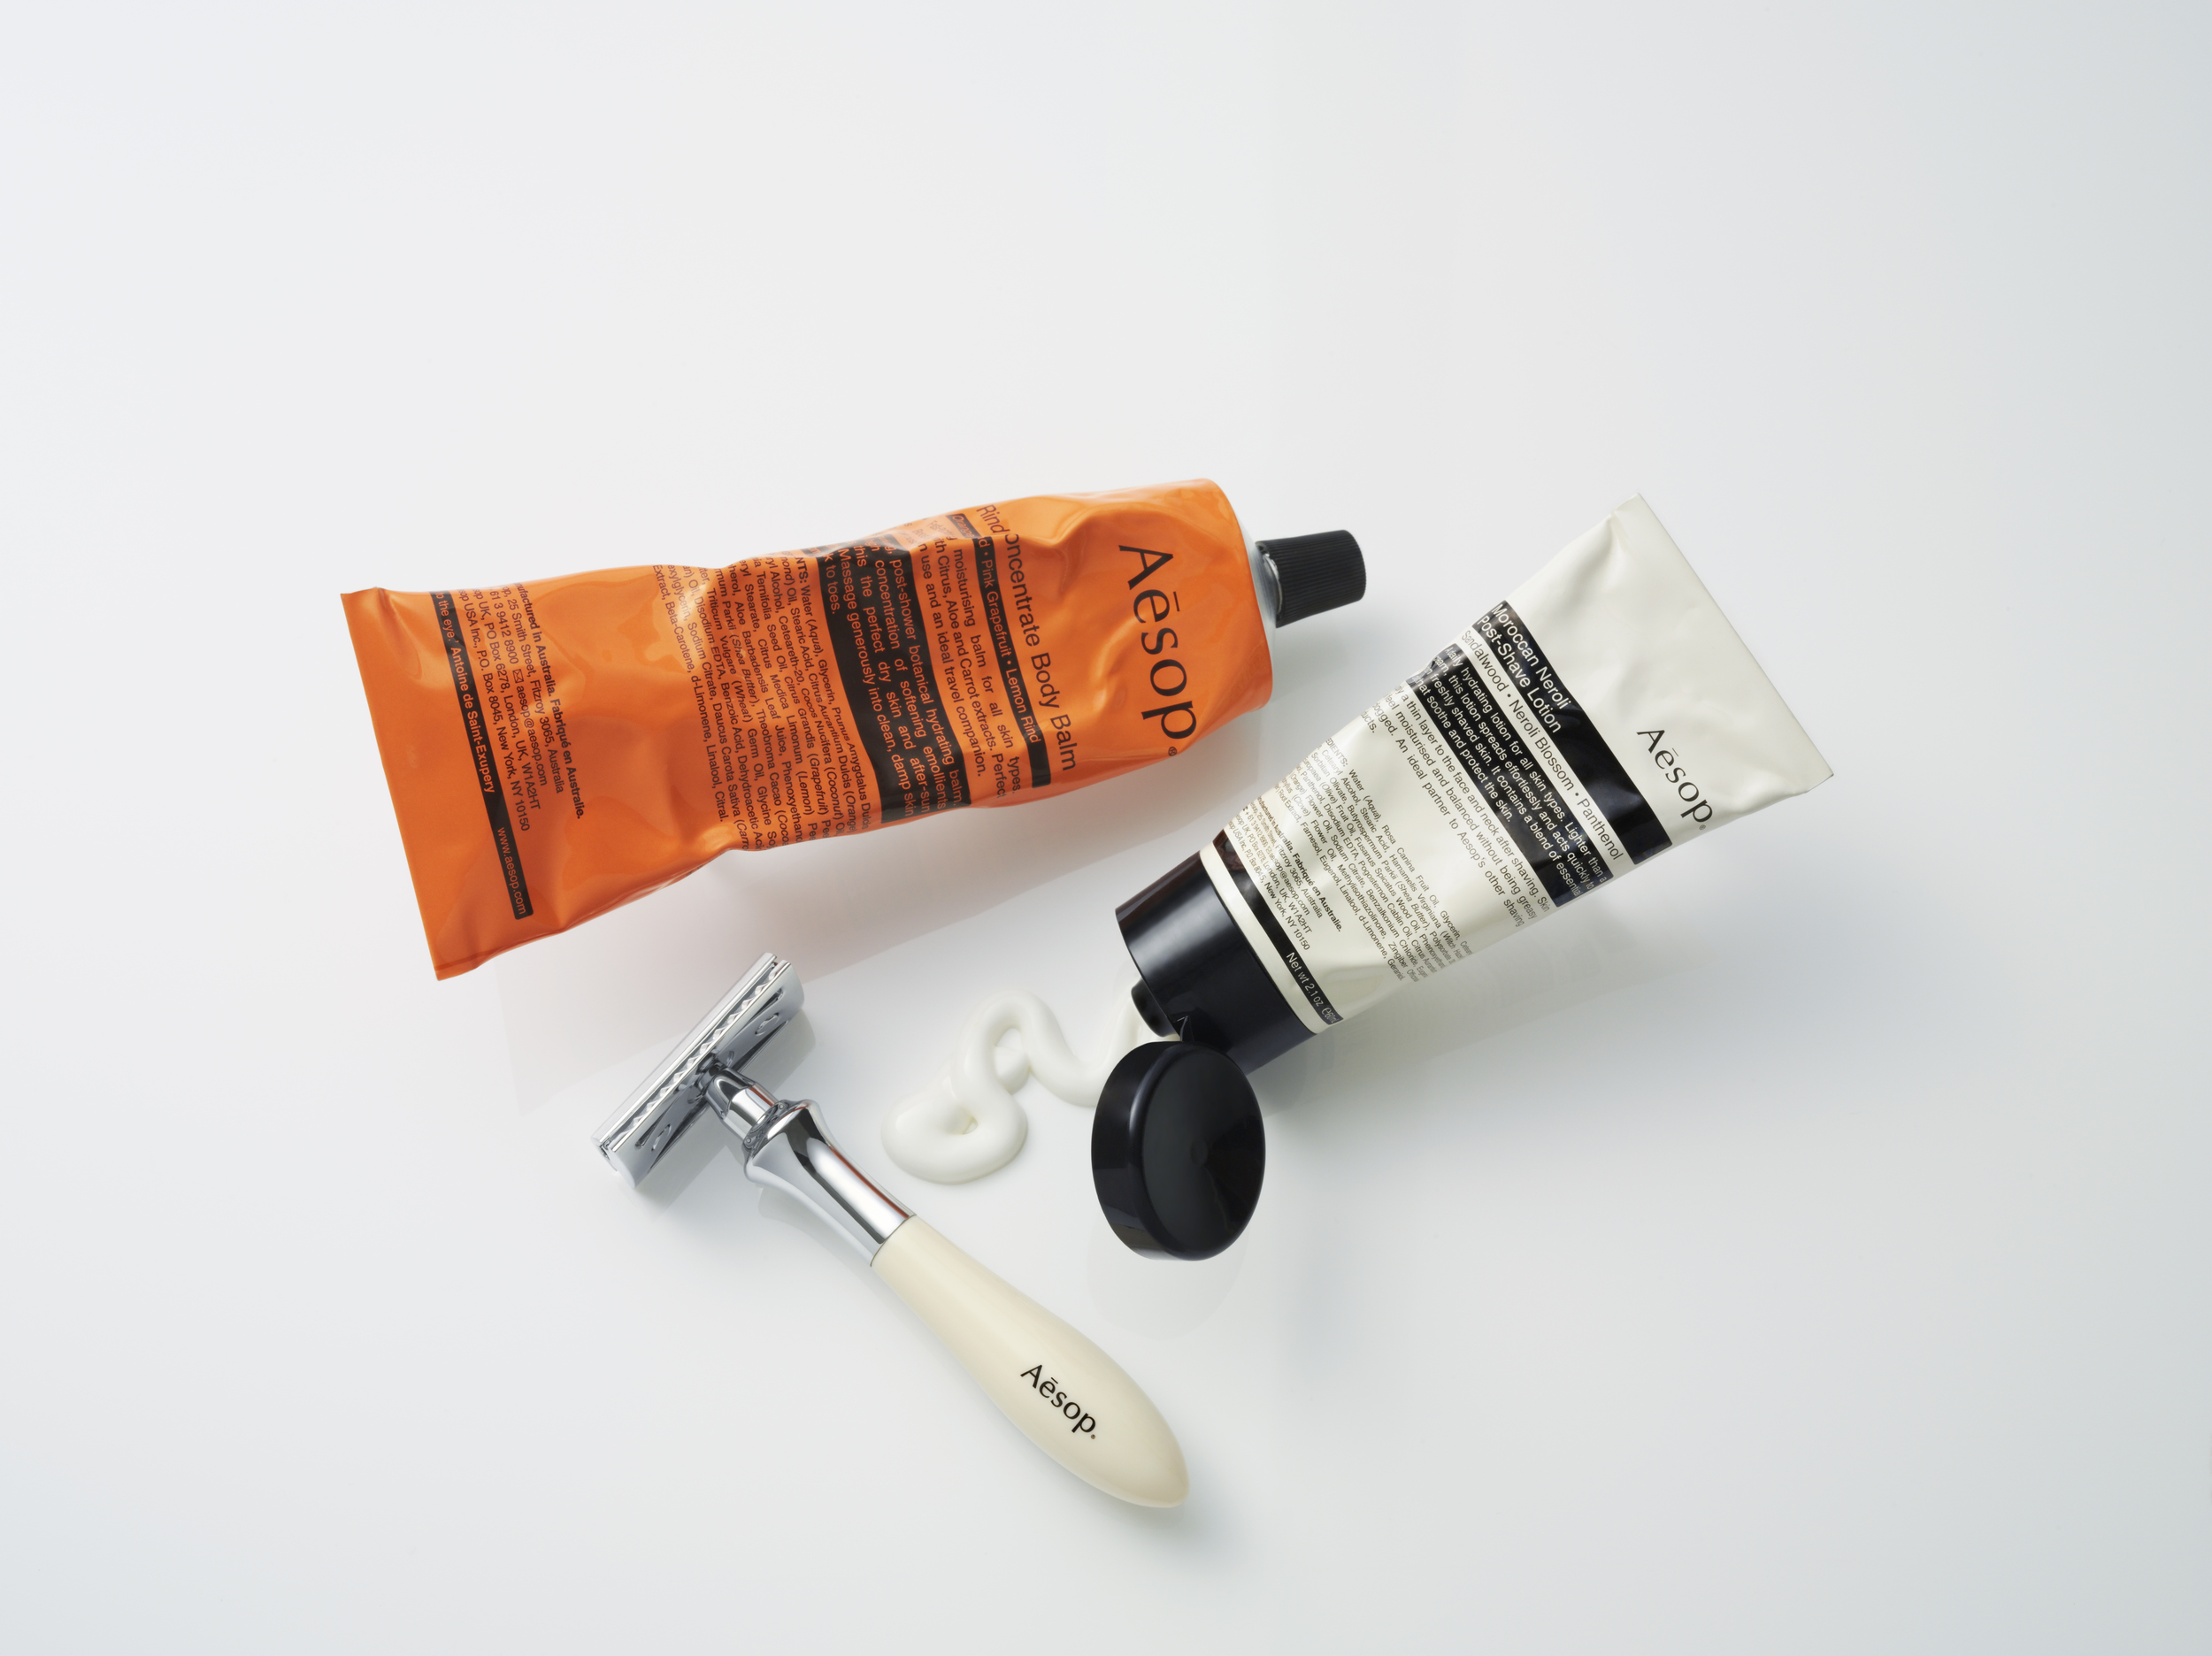 Aesop  body balm,  Aesop  shave lotion, Aseop  razor.